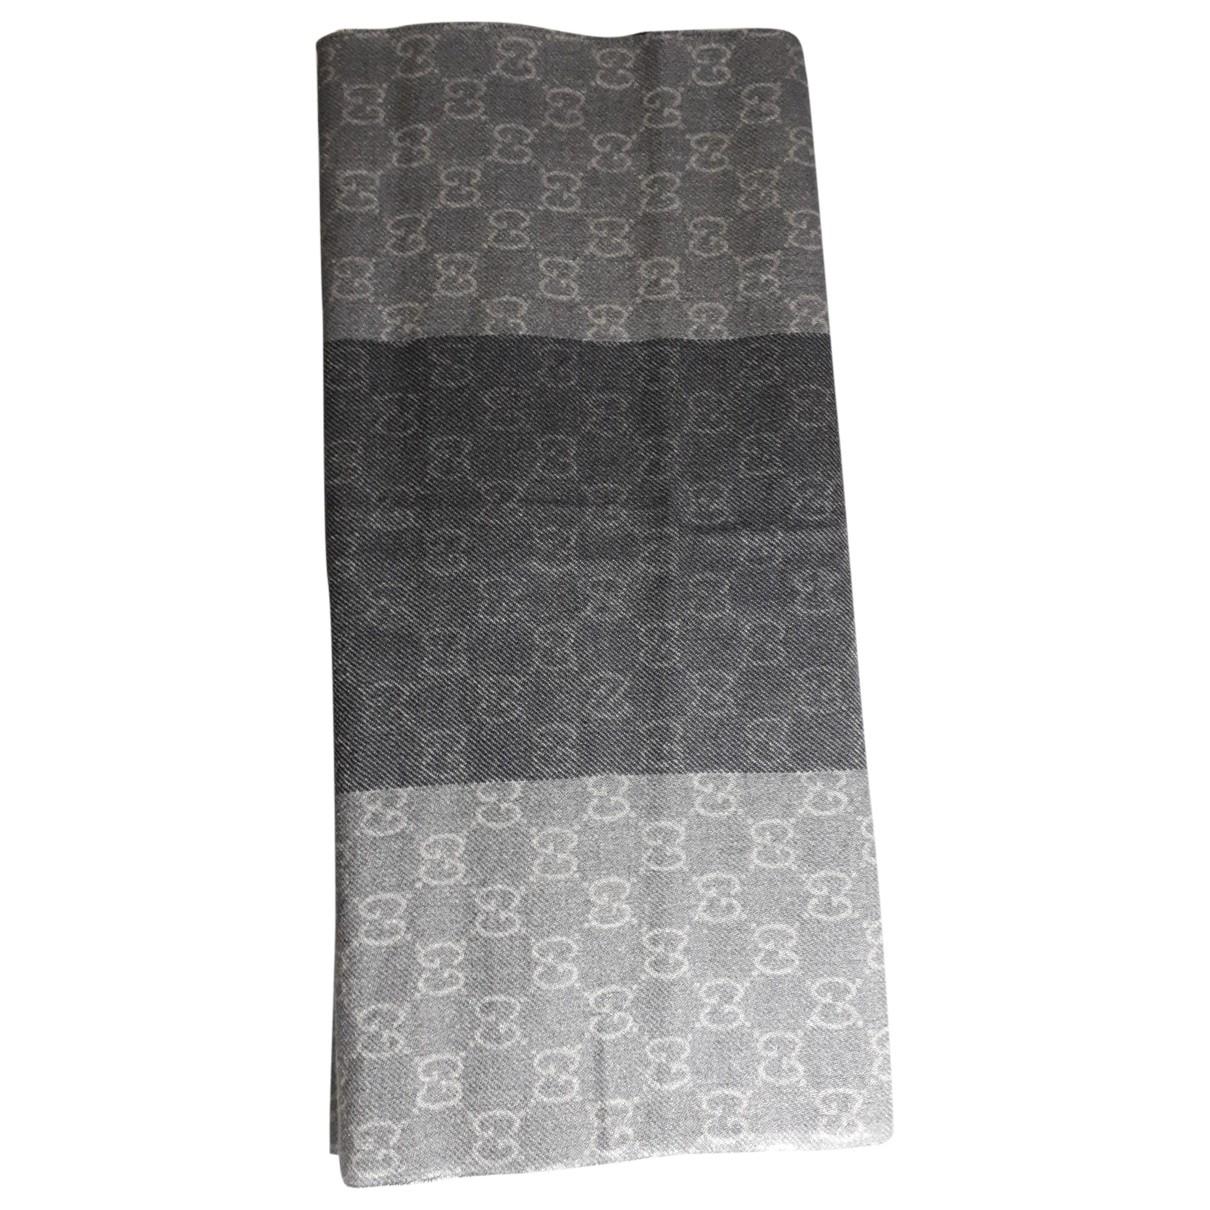 Gucci \N Tuecher, Schal in  Grau Wolle